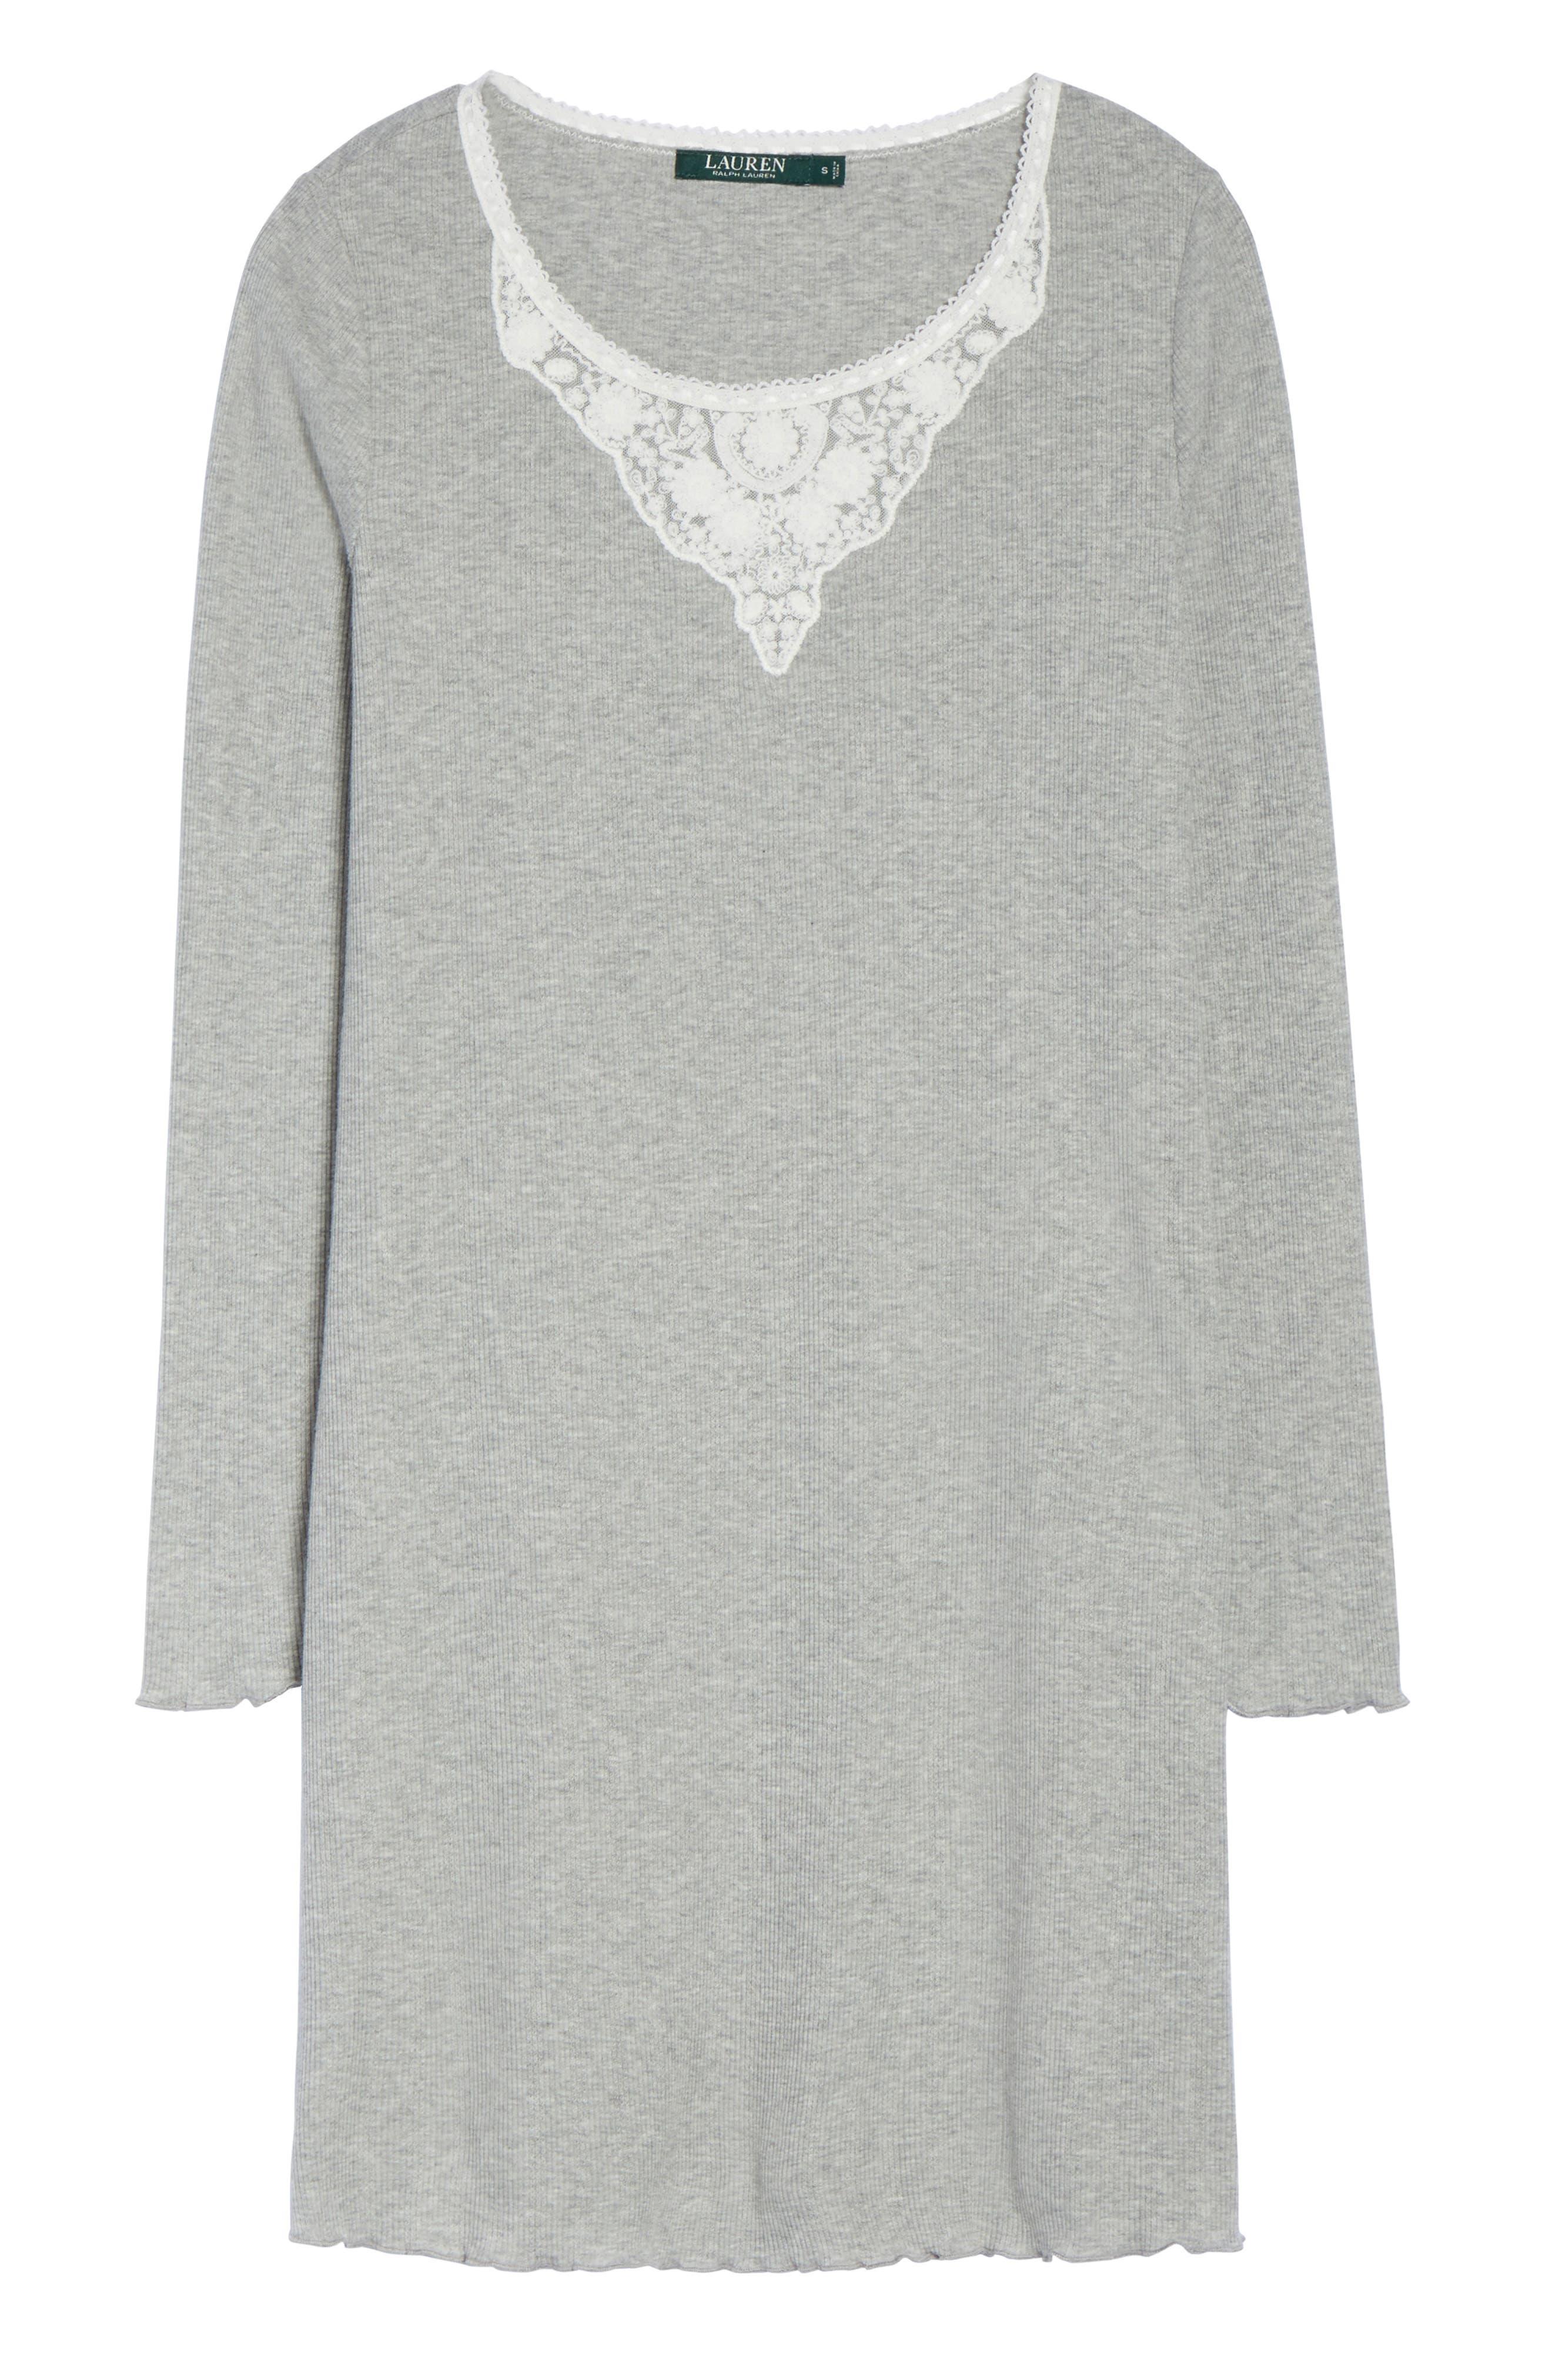 Lace Neck Sleep Shirt,                             Alternate thumbnail 6, color,                             022